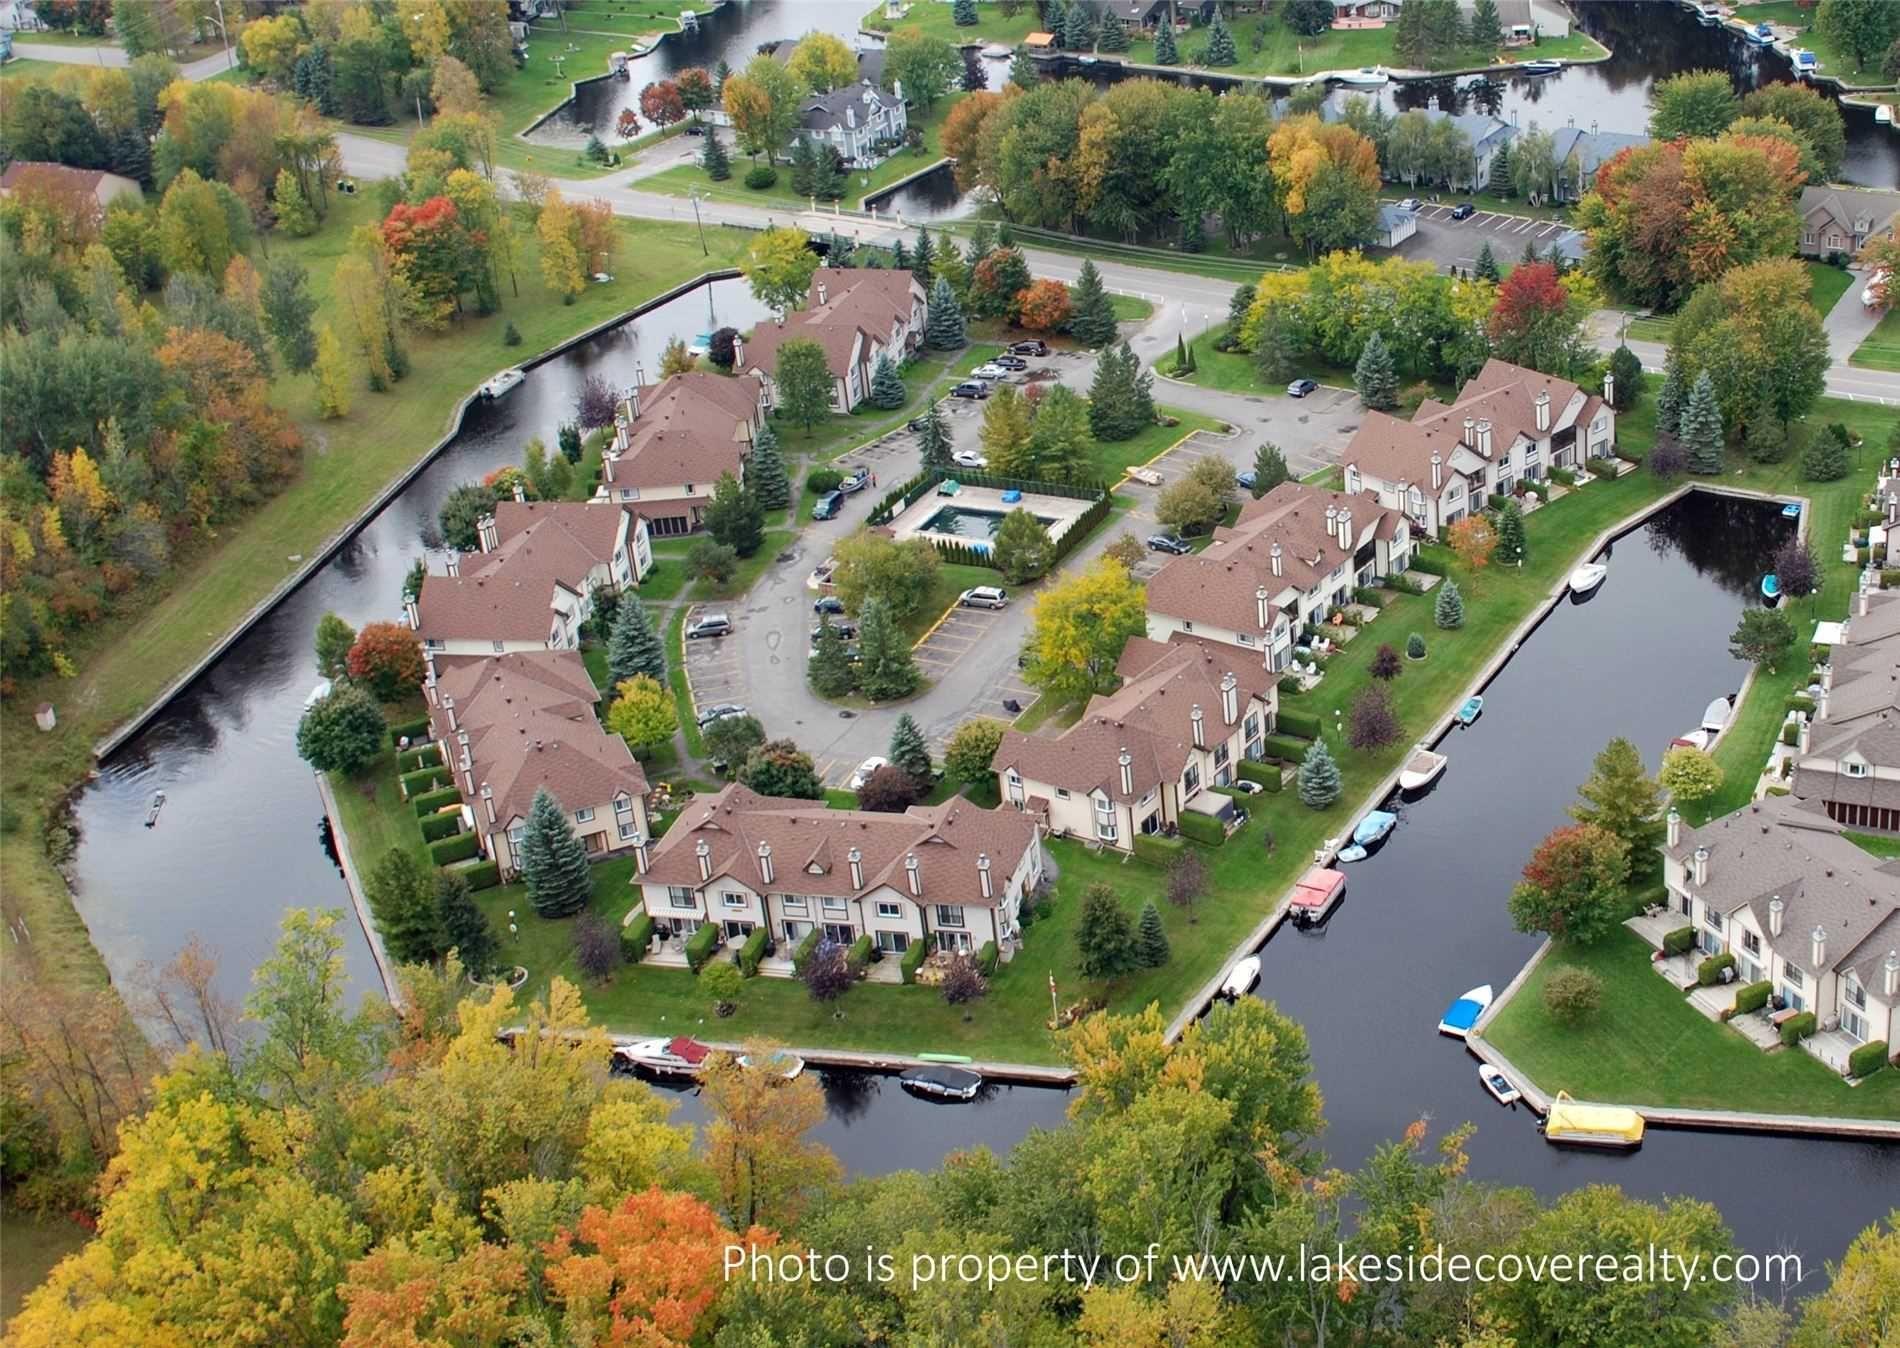 Main Photo: 31 11 Laguna Parkway in Ramara: Brechin Condo for sale : MLS®# S5308411